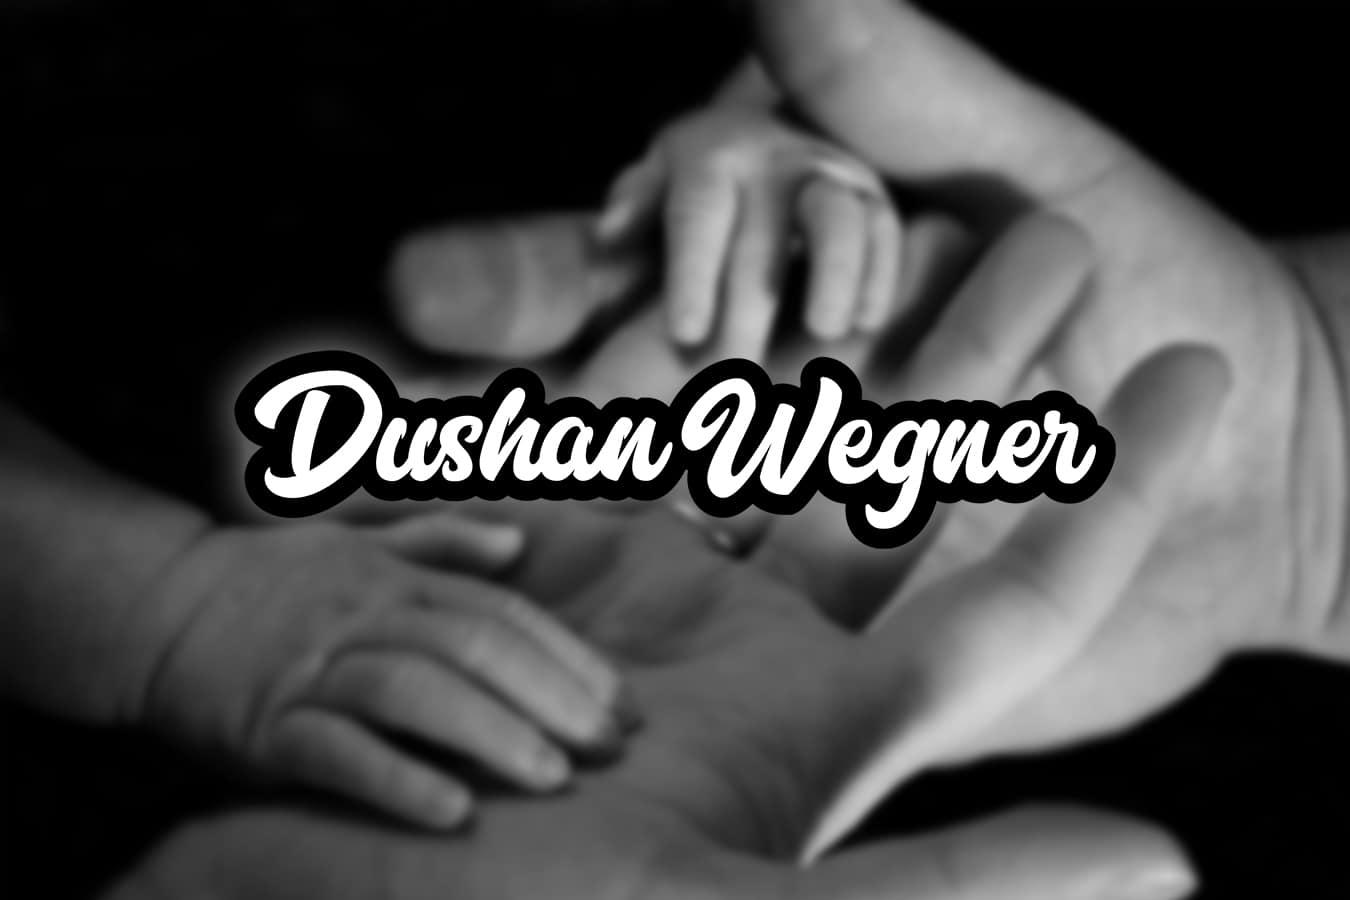 dushanwegner.com